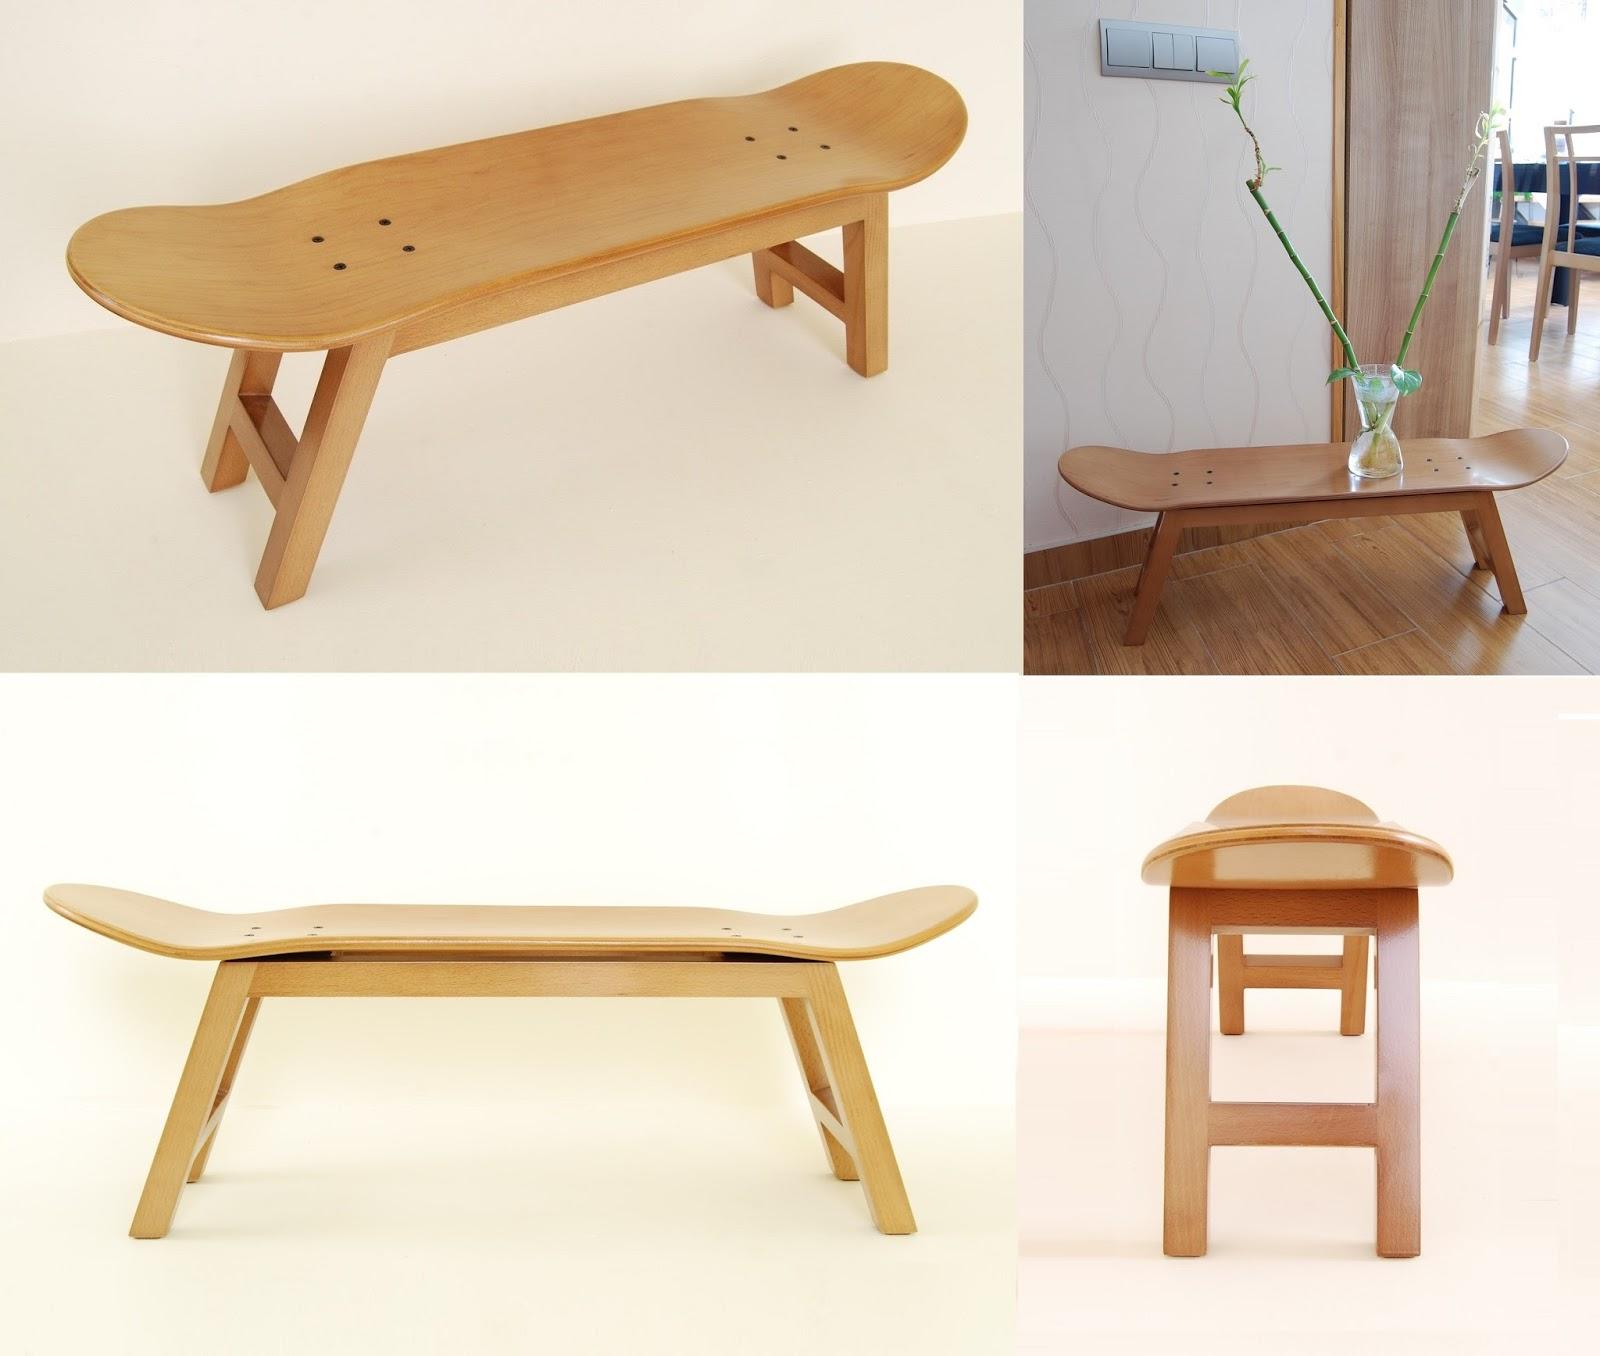 Skateboard Bedroom Furniture skateboard bedroom furniture. saveemail skateboard bedroom